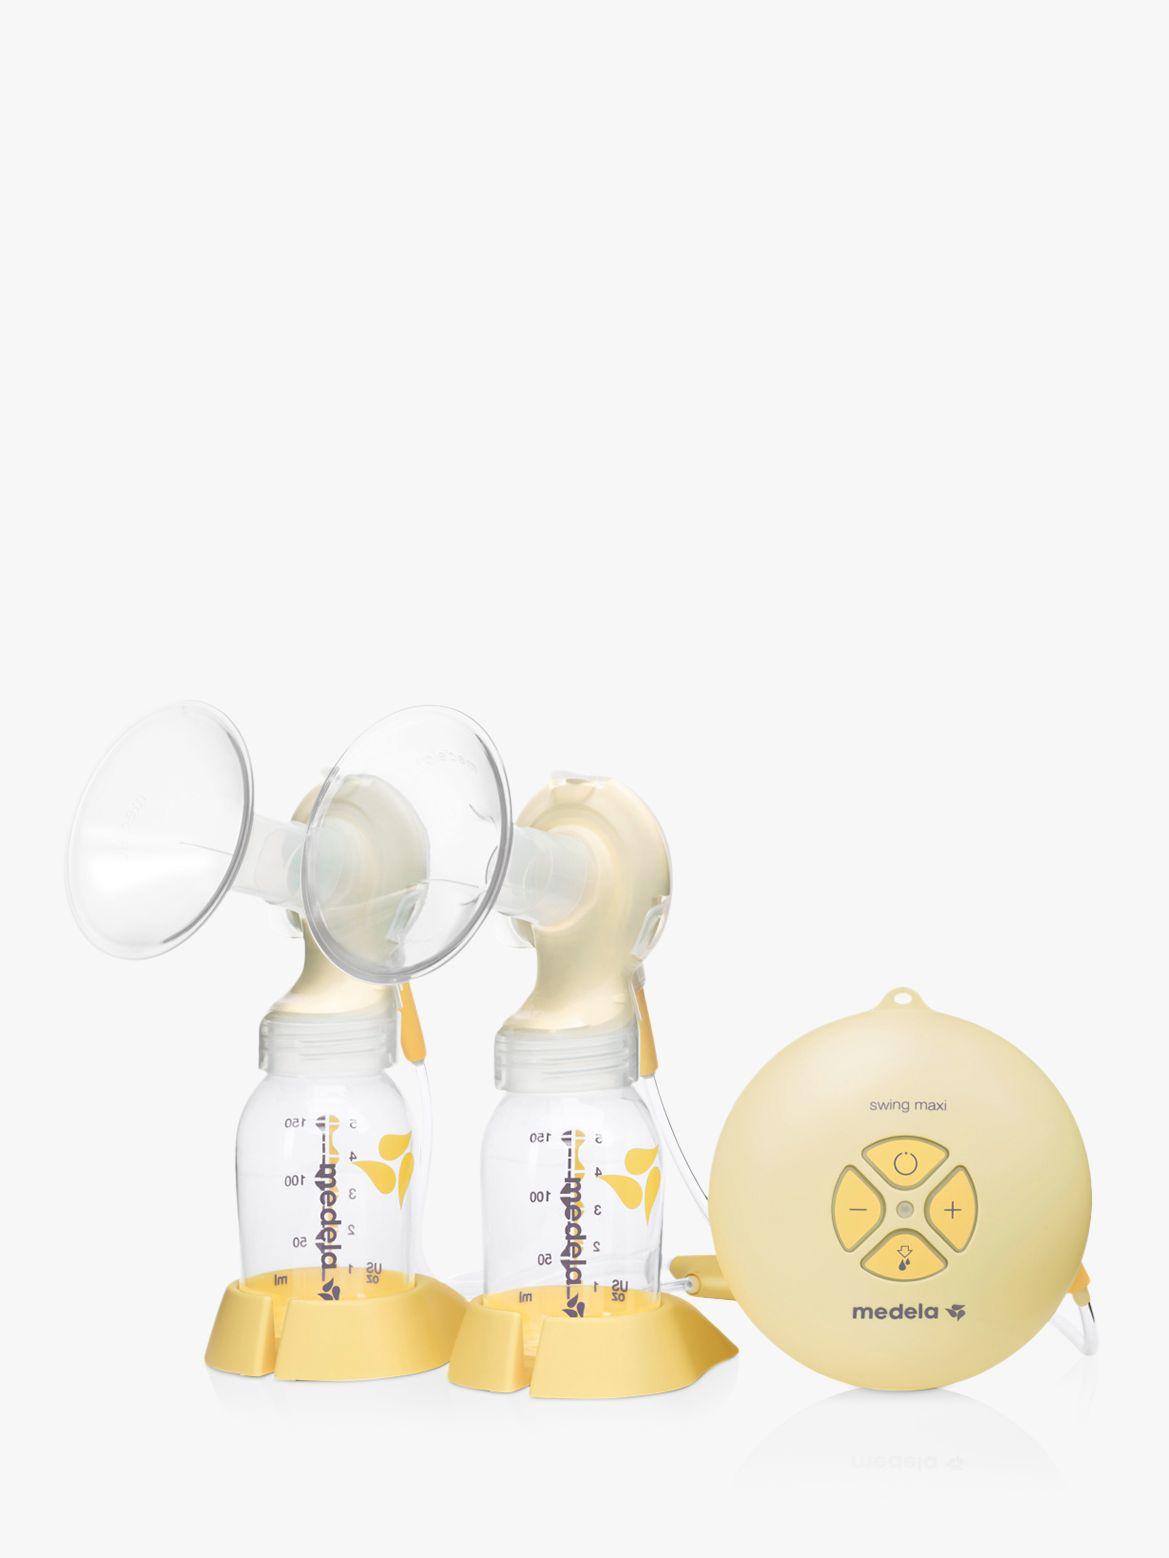 Medela Medela Swing Maxi Double Electric Breast Pump